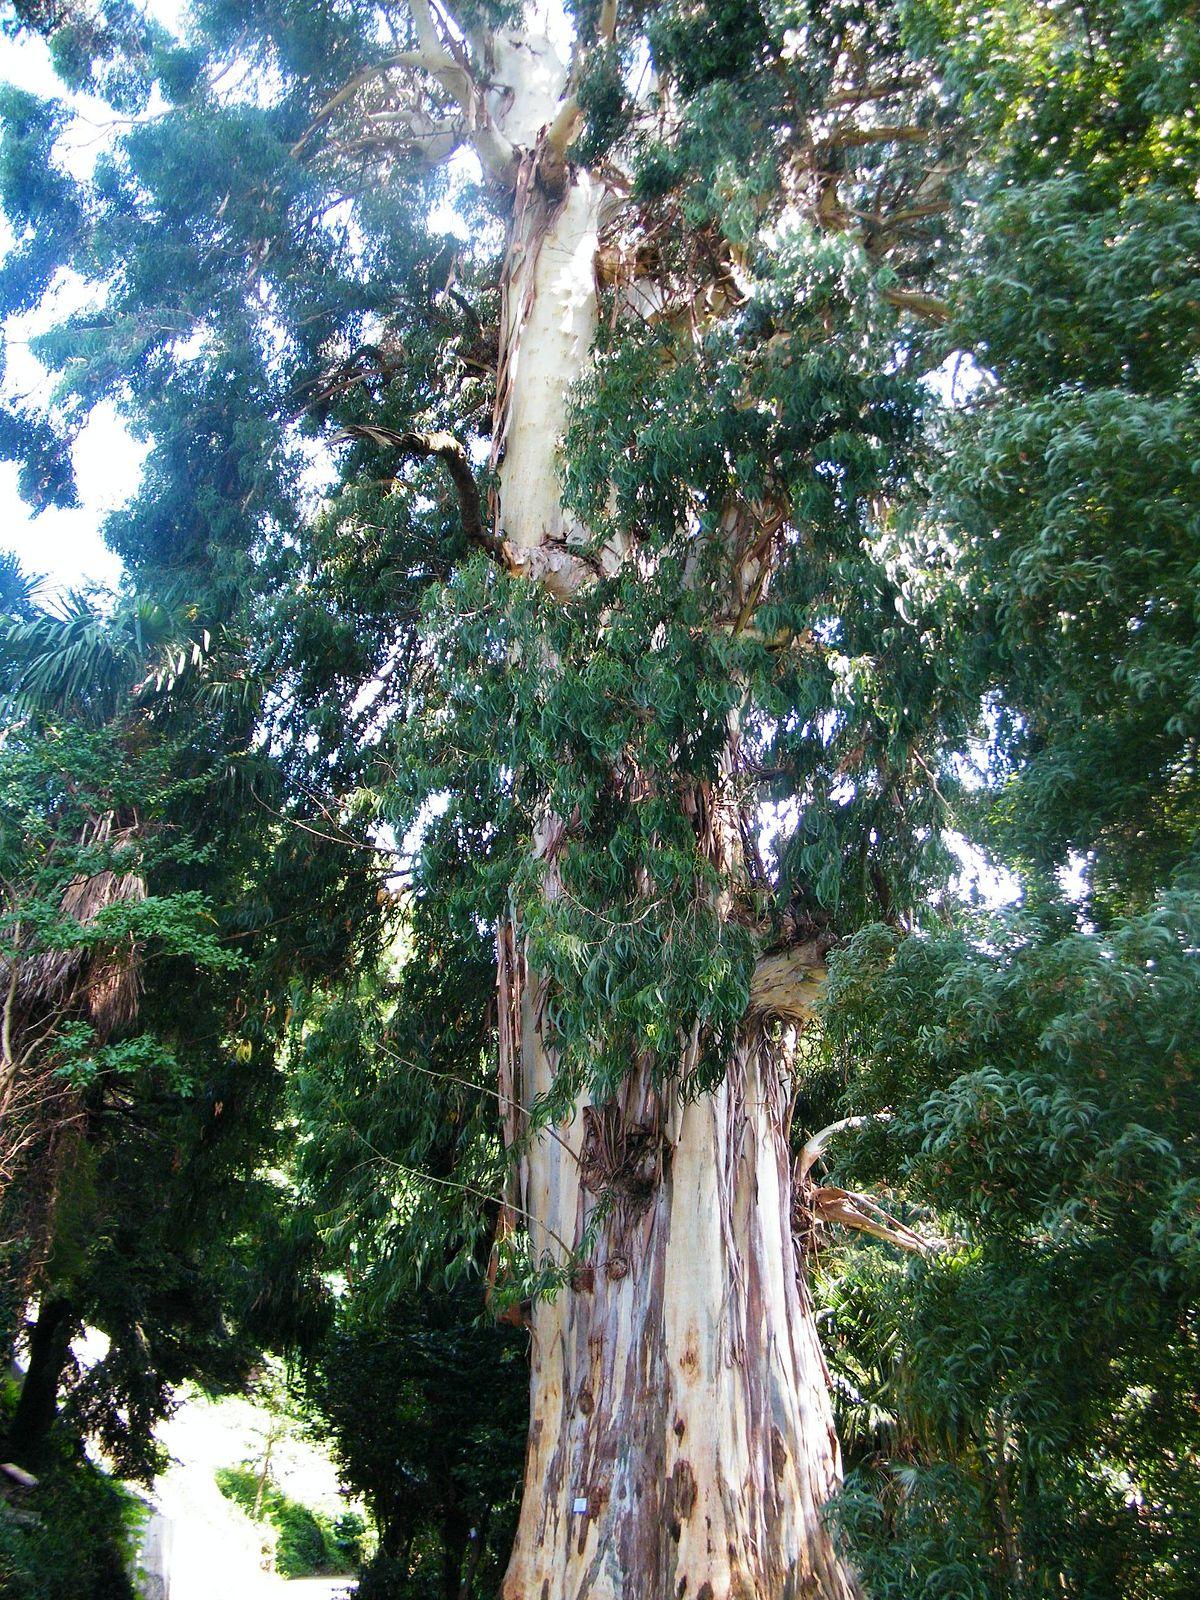 7574 ЕВКАЛІПТА НАСТОЙКА - Eucalyptus vitaminalis**